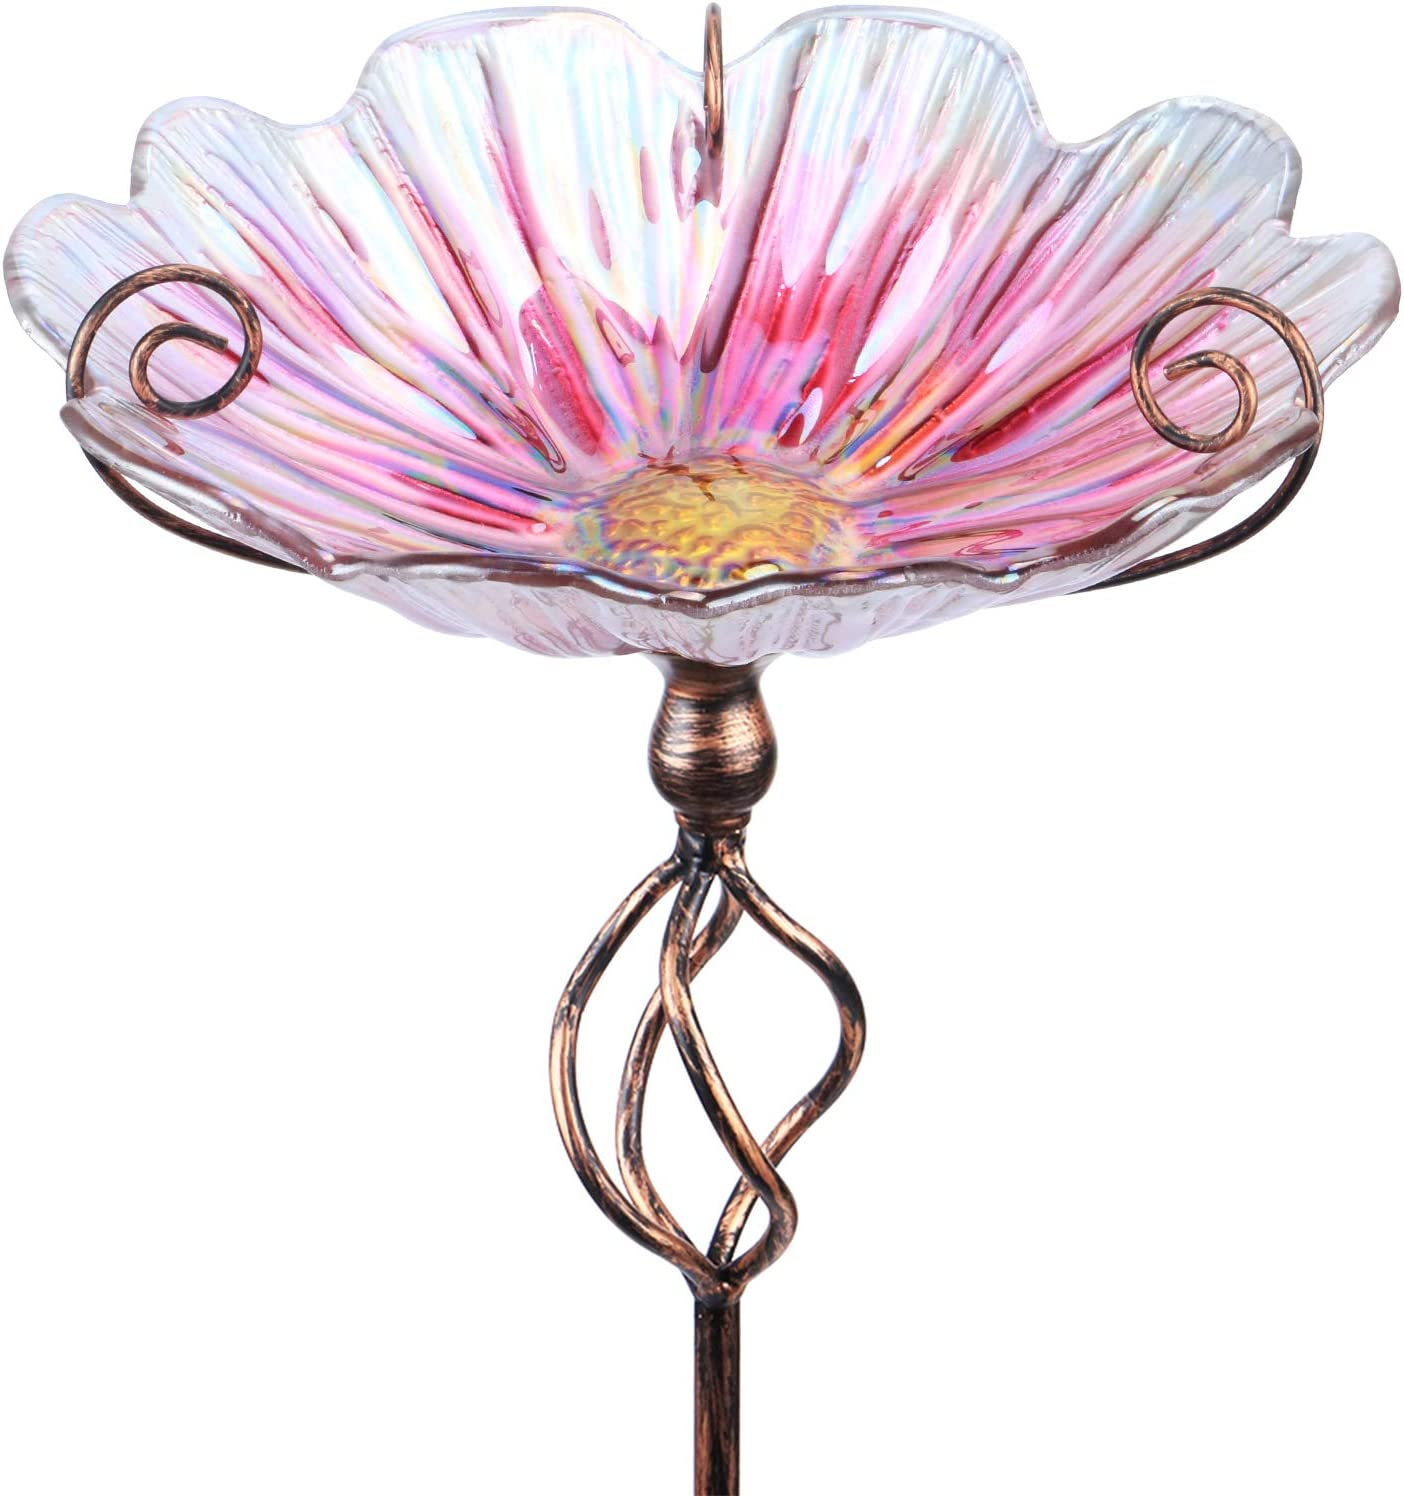 MUMTOP 31 Inch Height Glass Birdbath Birdfeeder with Metal Stake Garden Yard Outdoor Pink